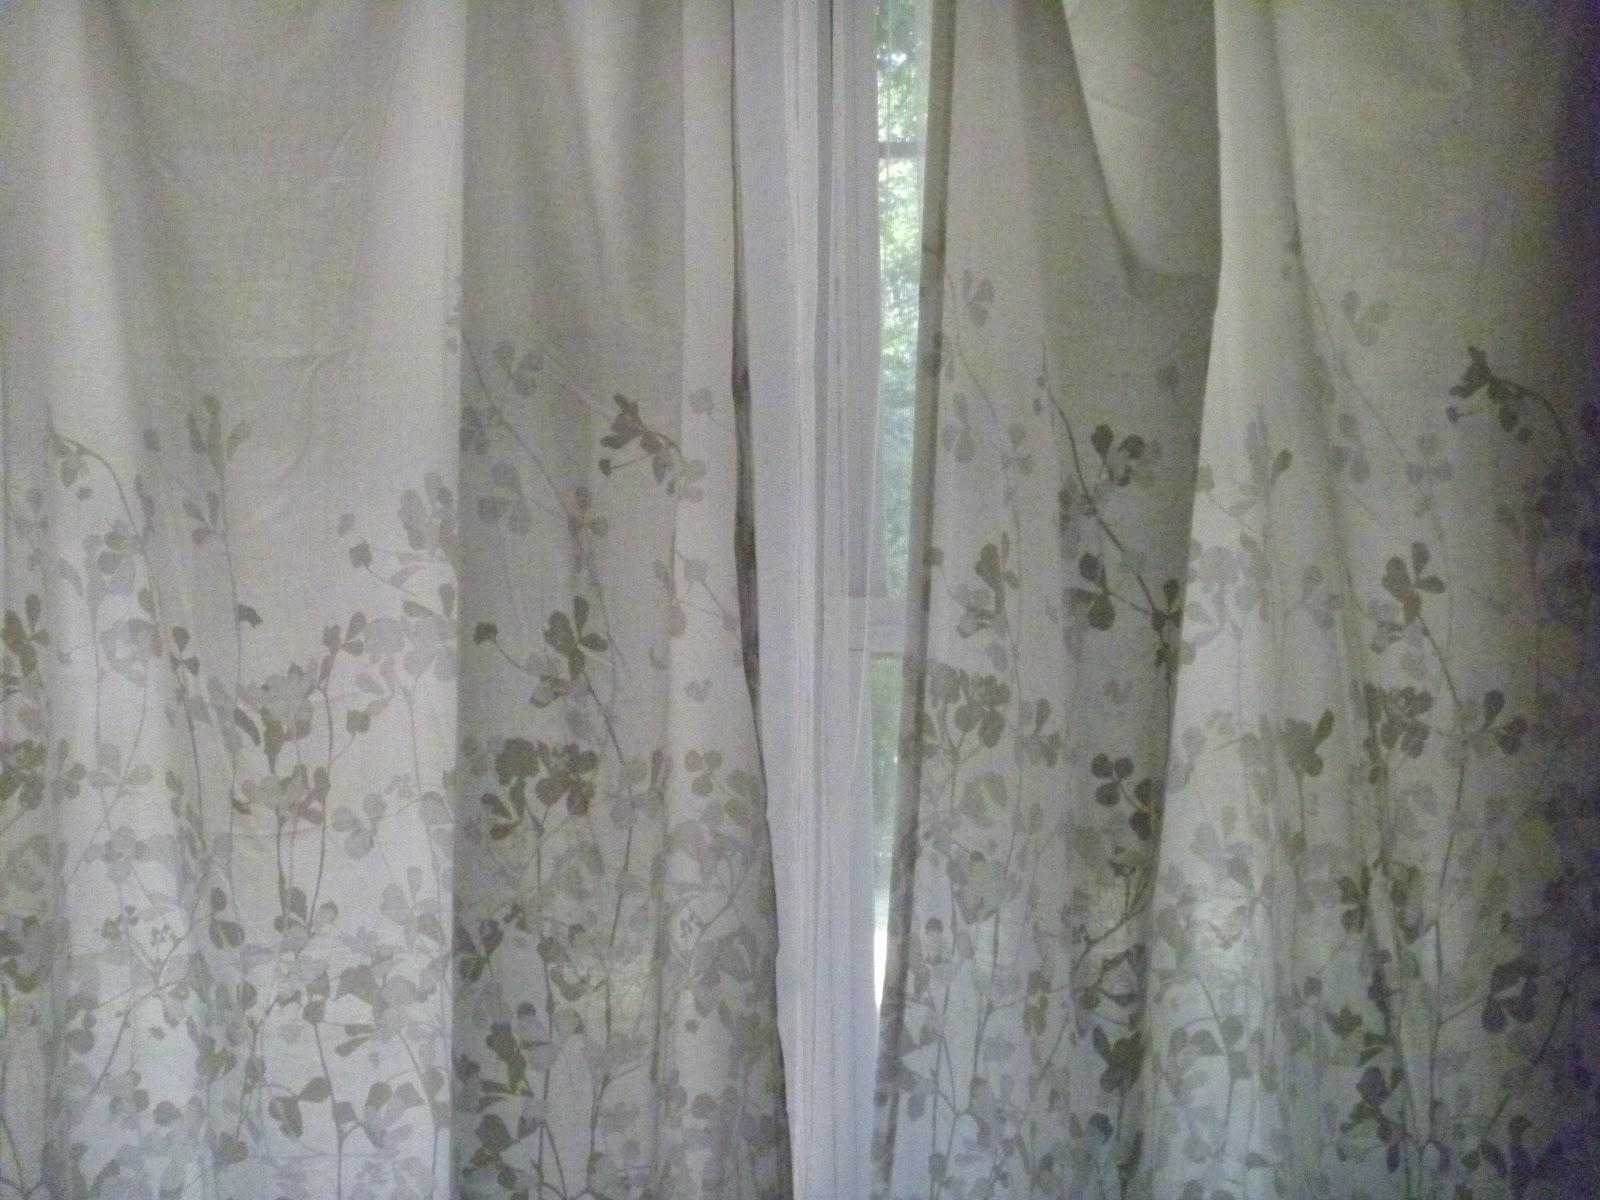 Ikea Kids Curtains Ikea shower curtains that i'm